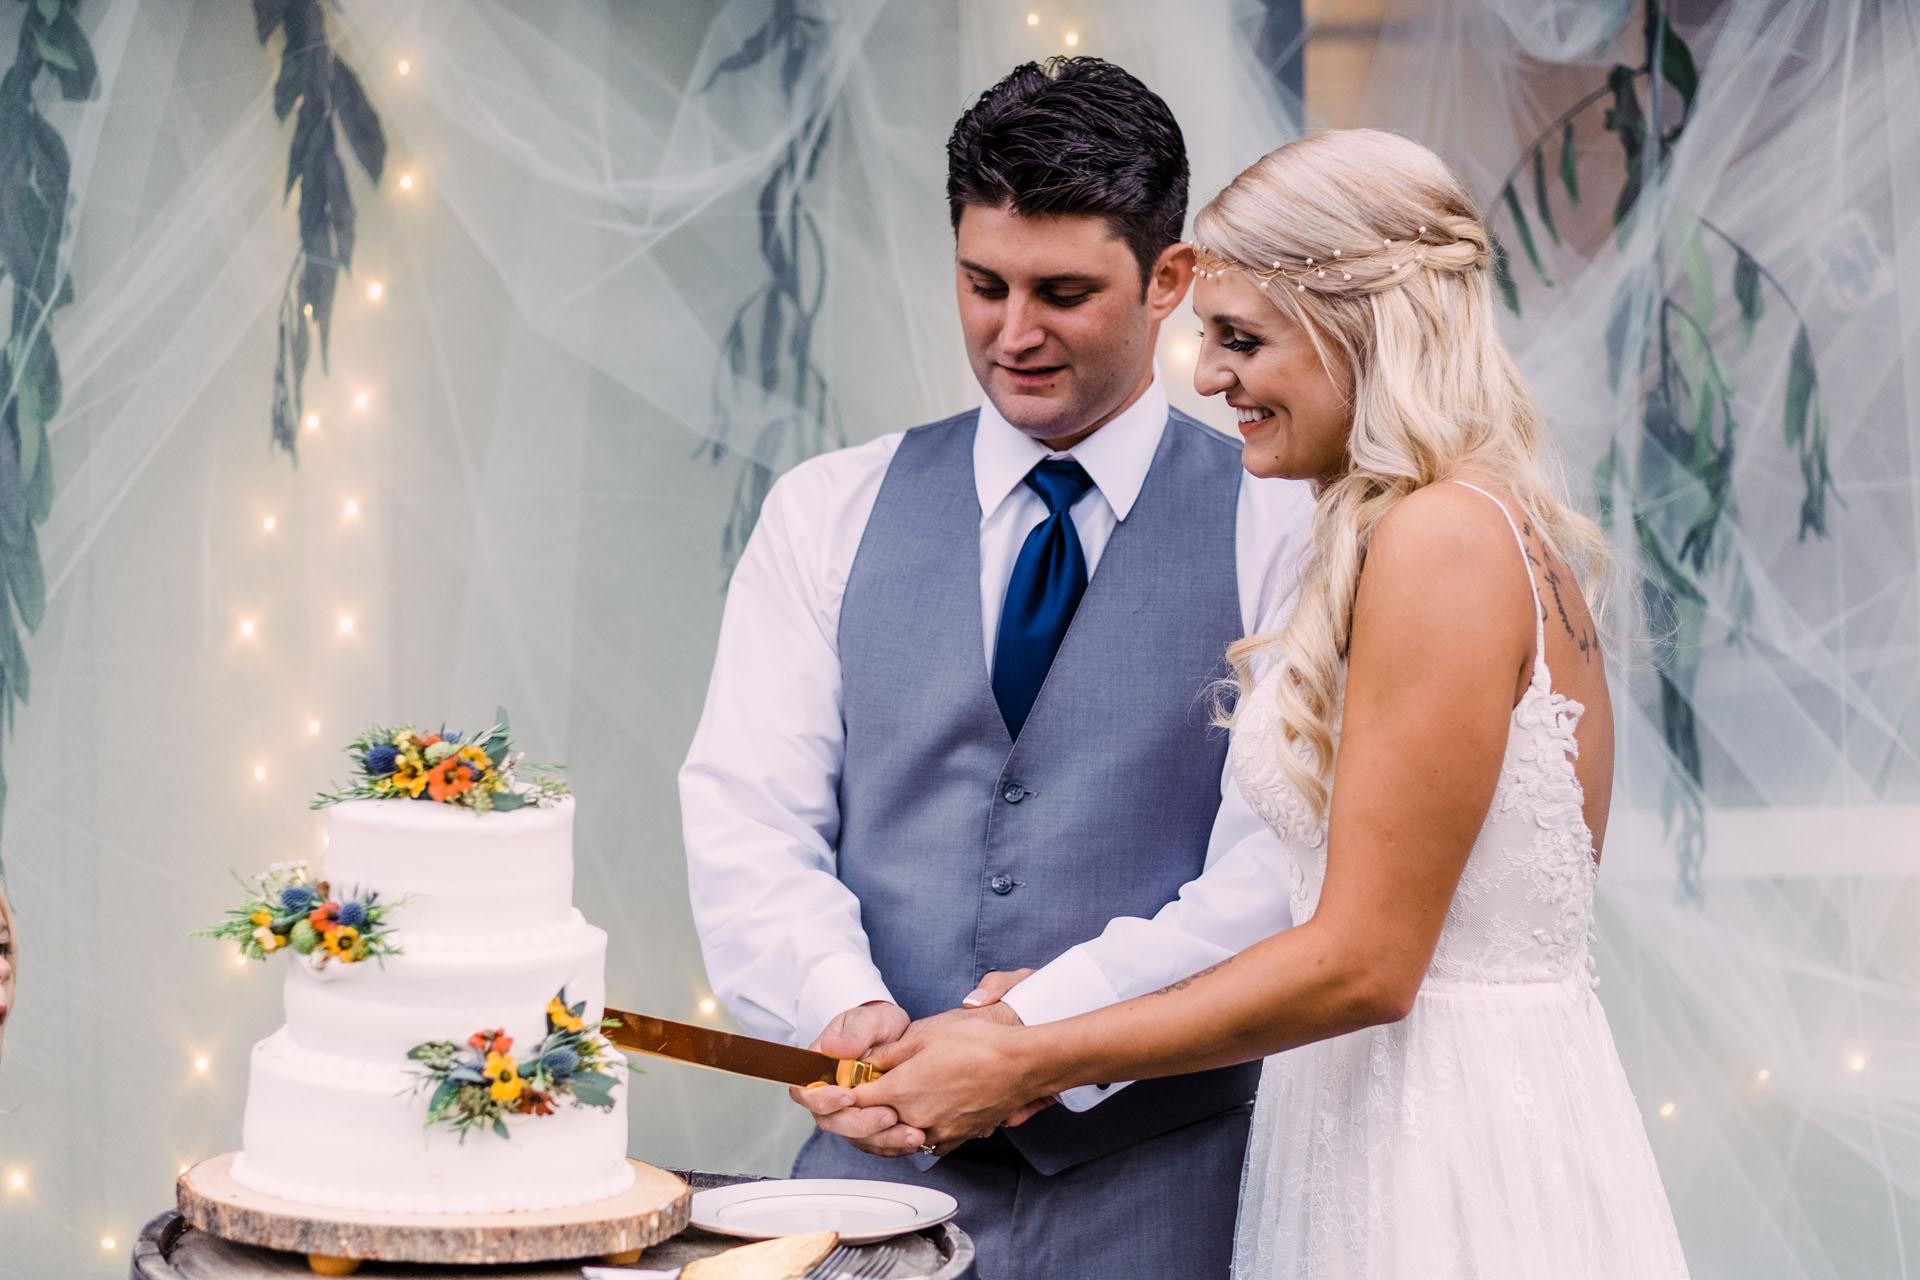 10-7-17 Devon and Jordan's Wedding-210.jpg